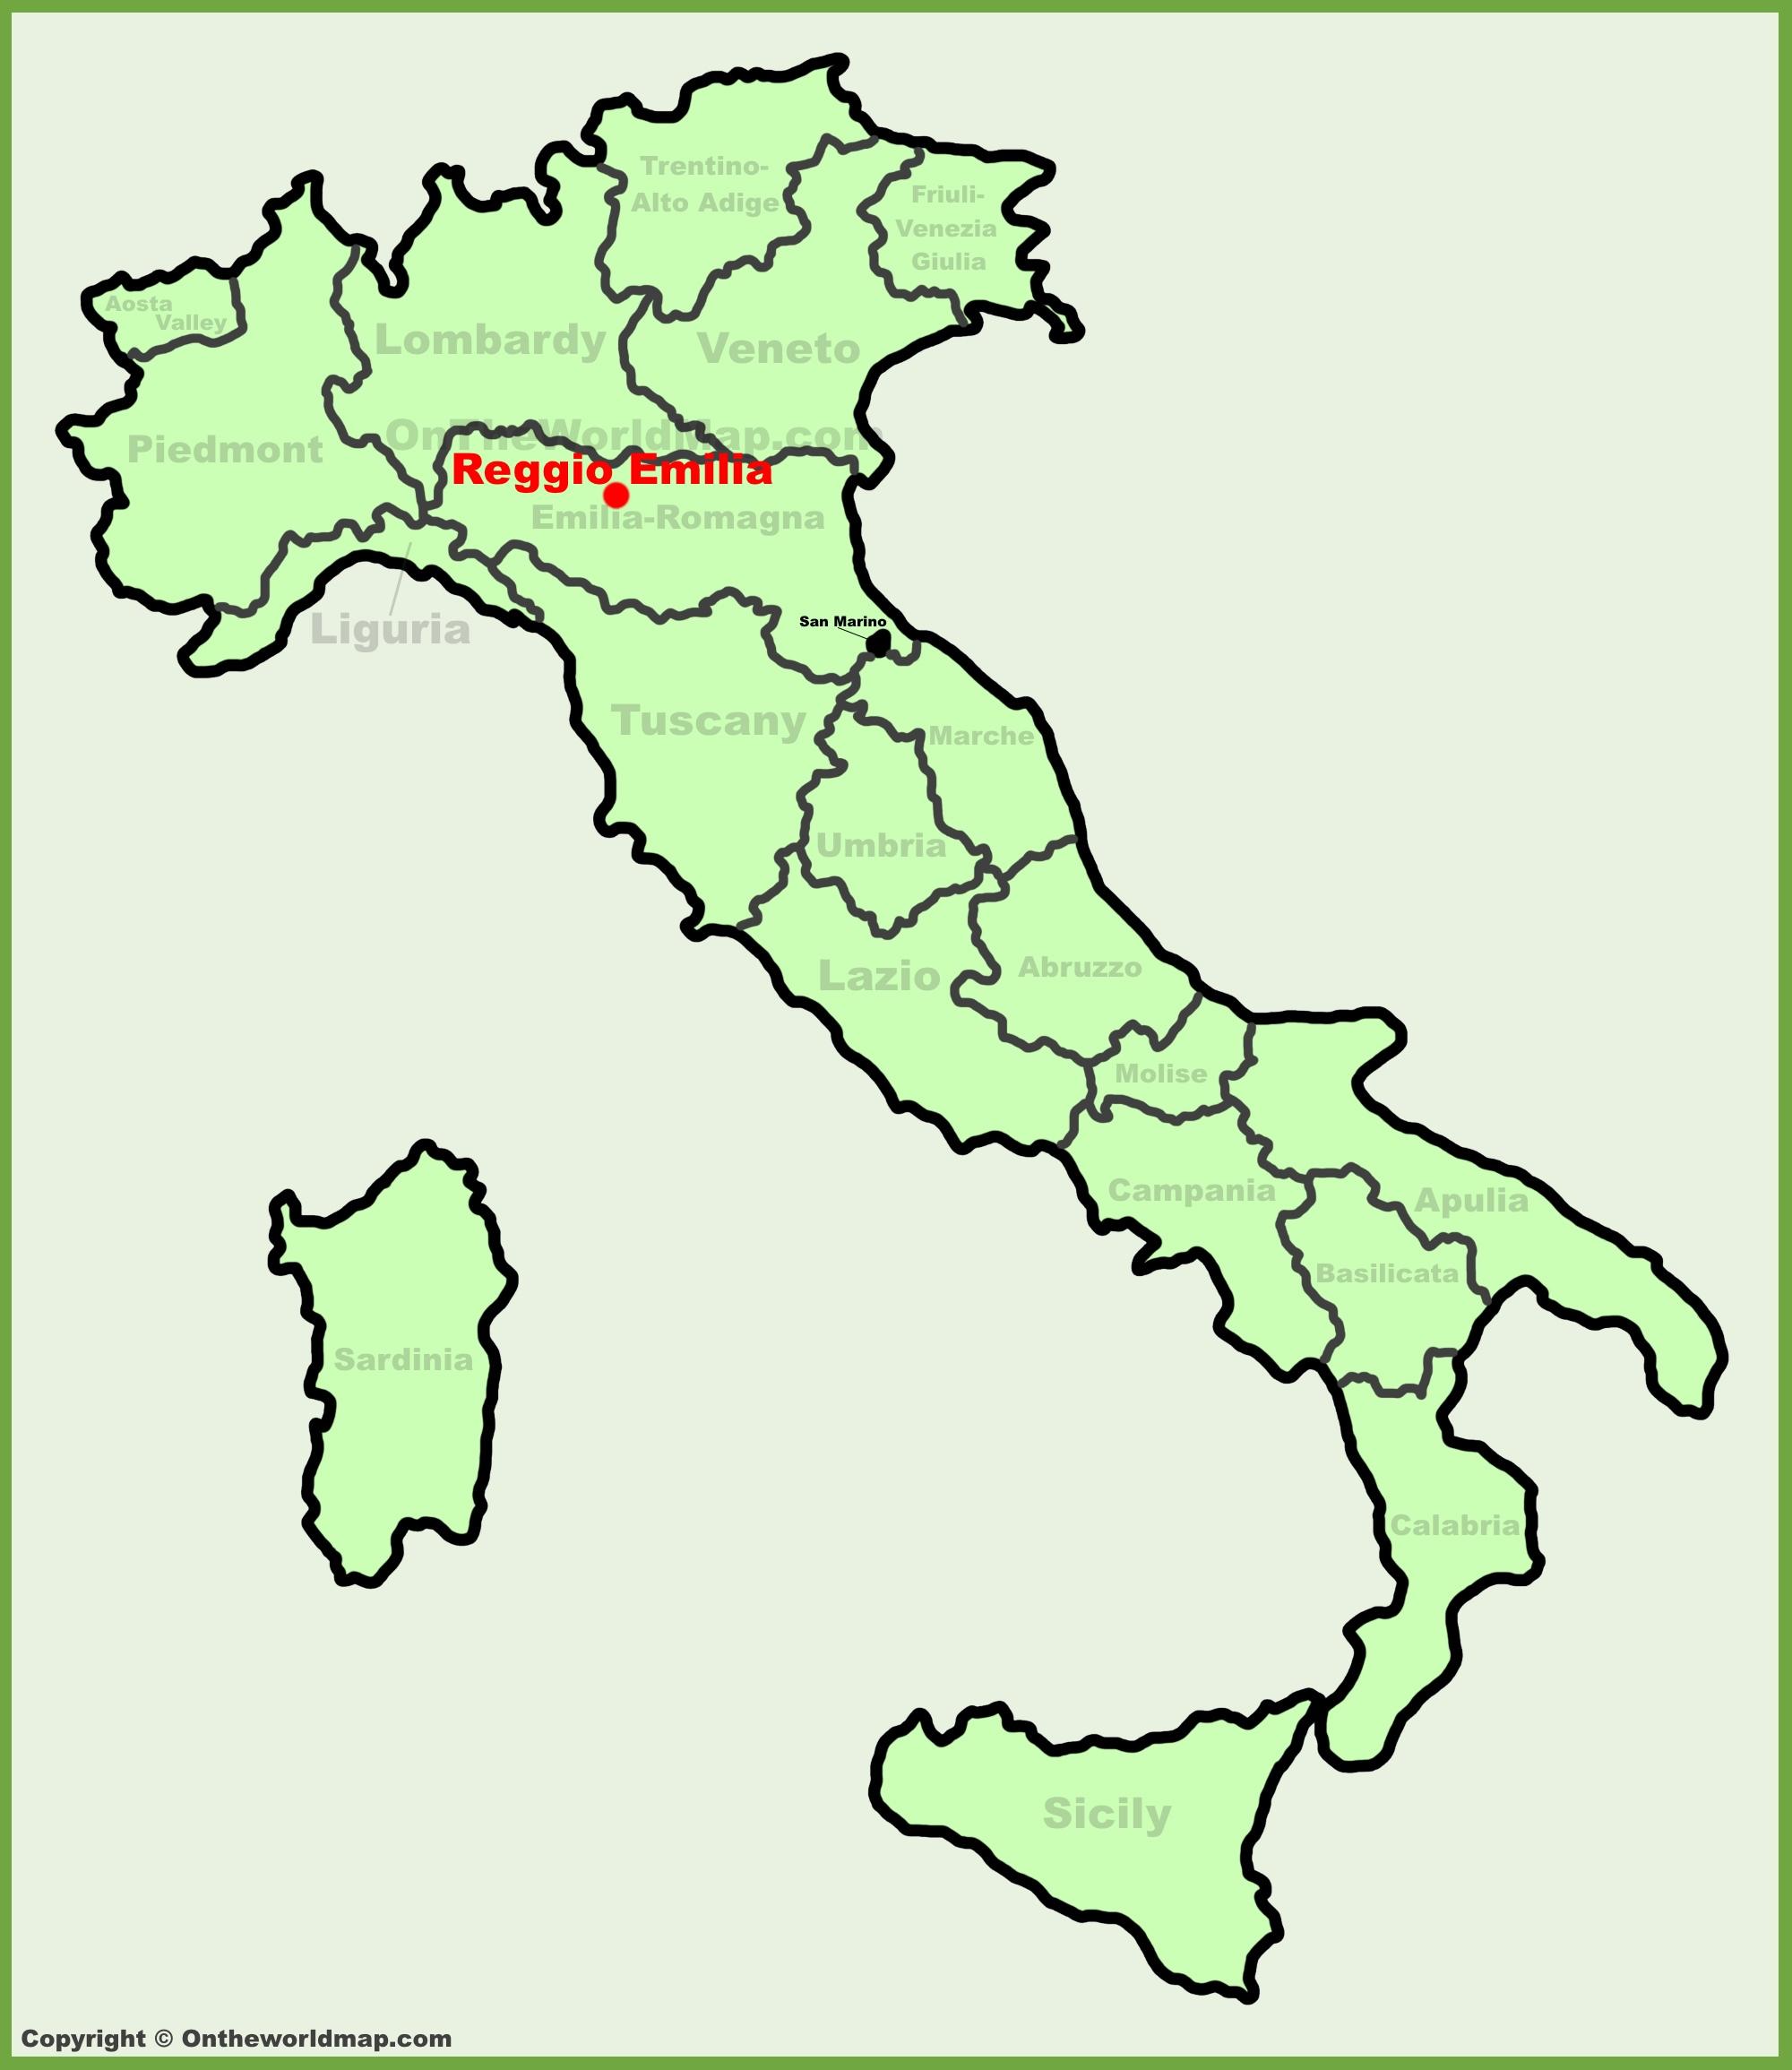 Reggio Emilia Location On The Italy Map